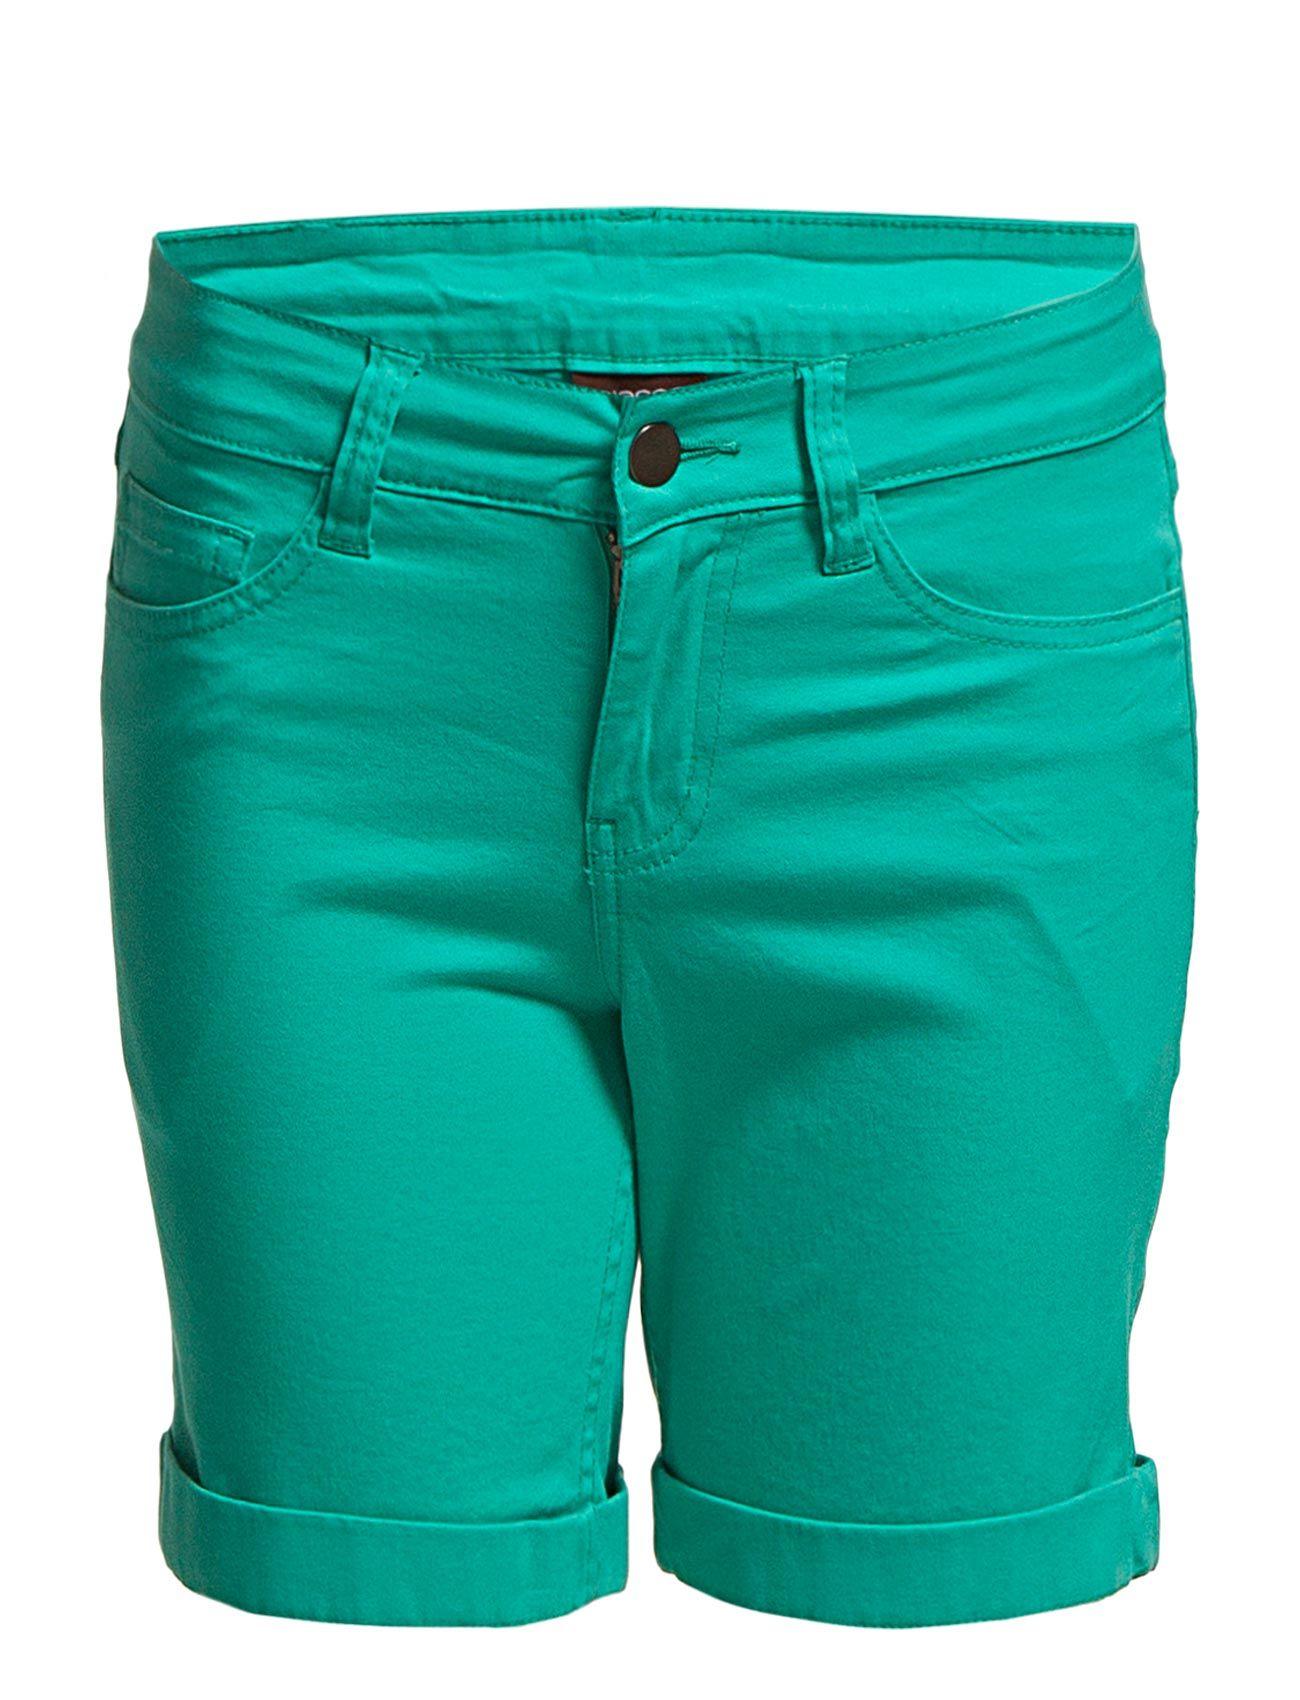 Funky Five Shorts/Bermuda Green